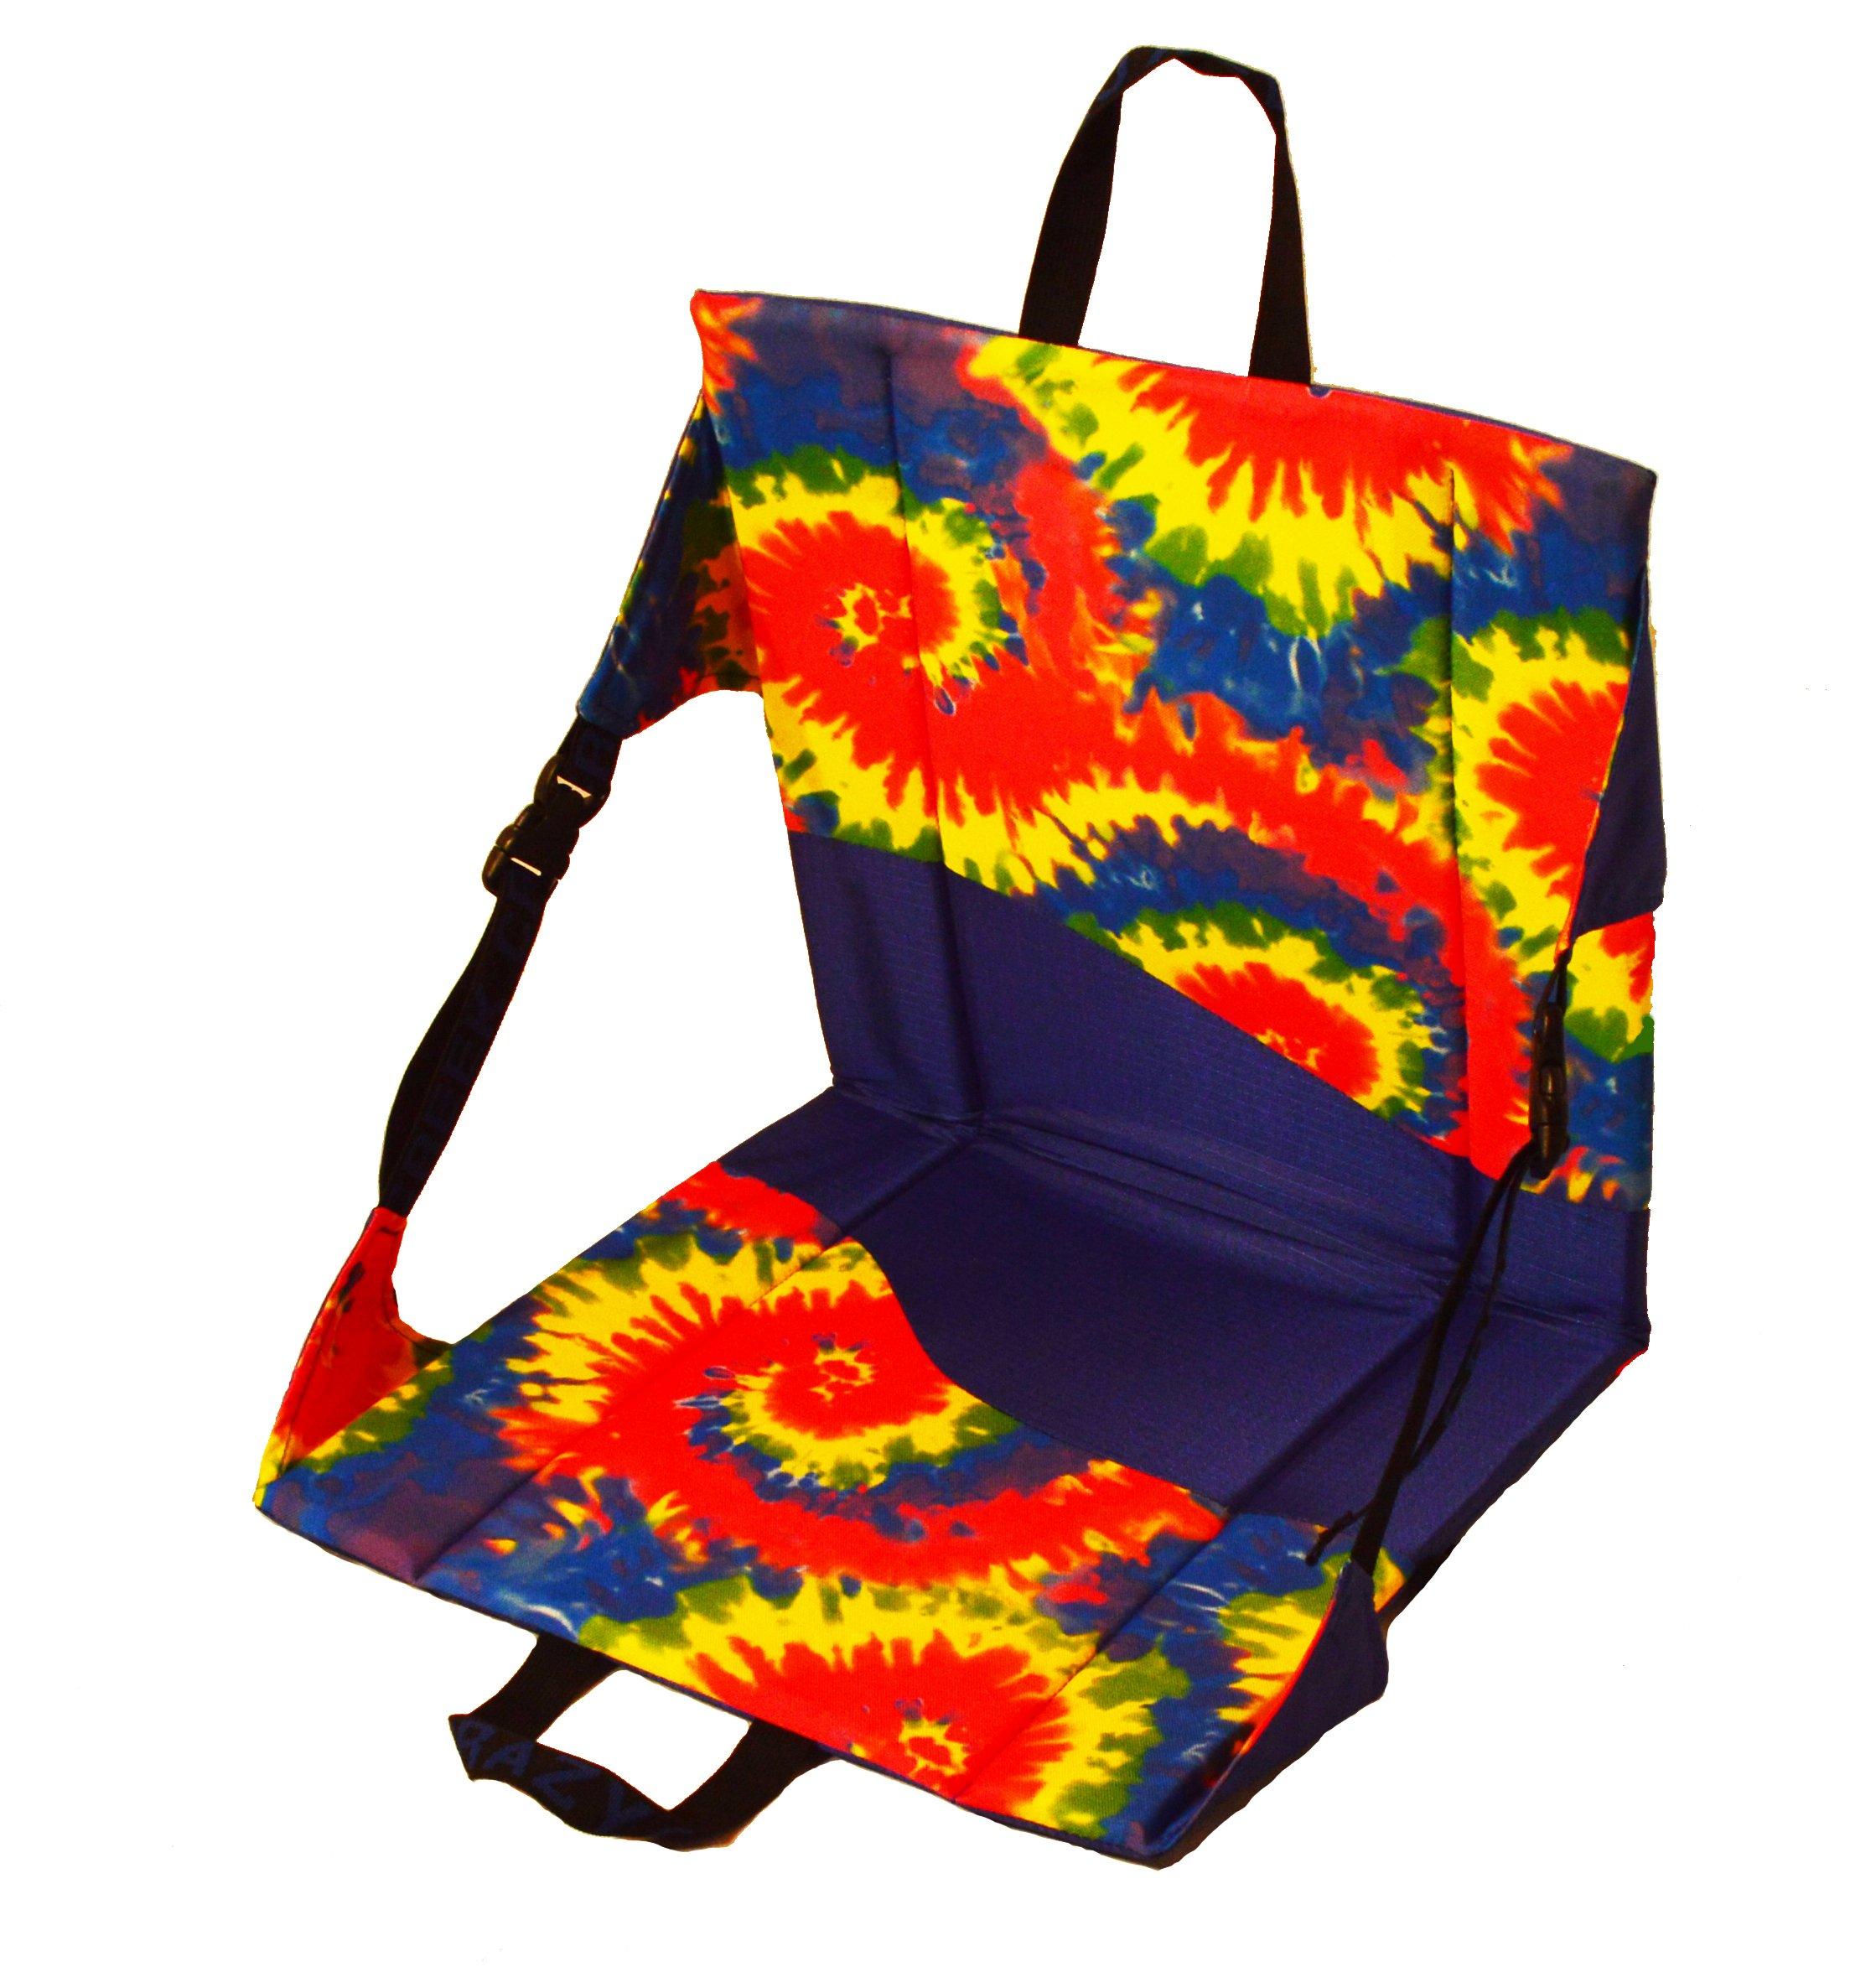 Crazy Creek Products Original Chair, Royal/Tie-Dye